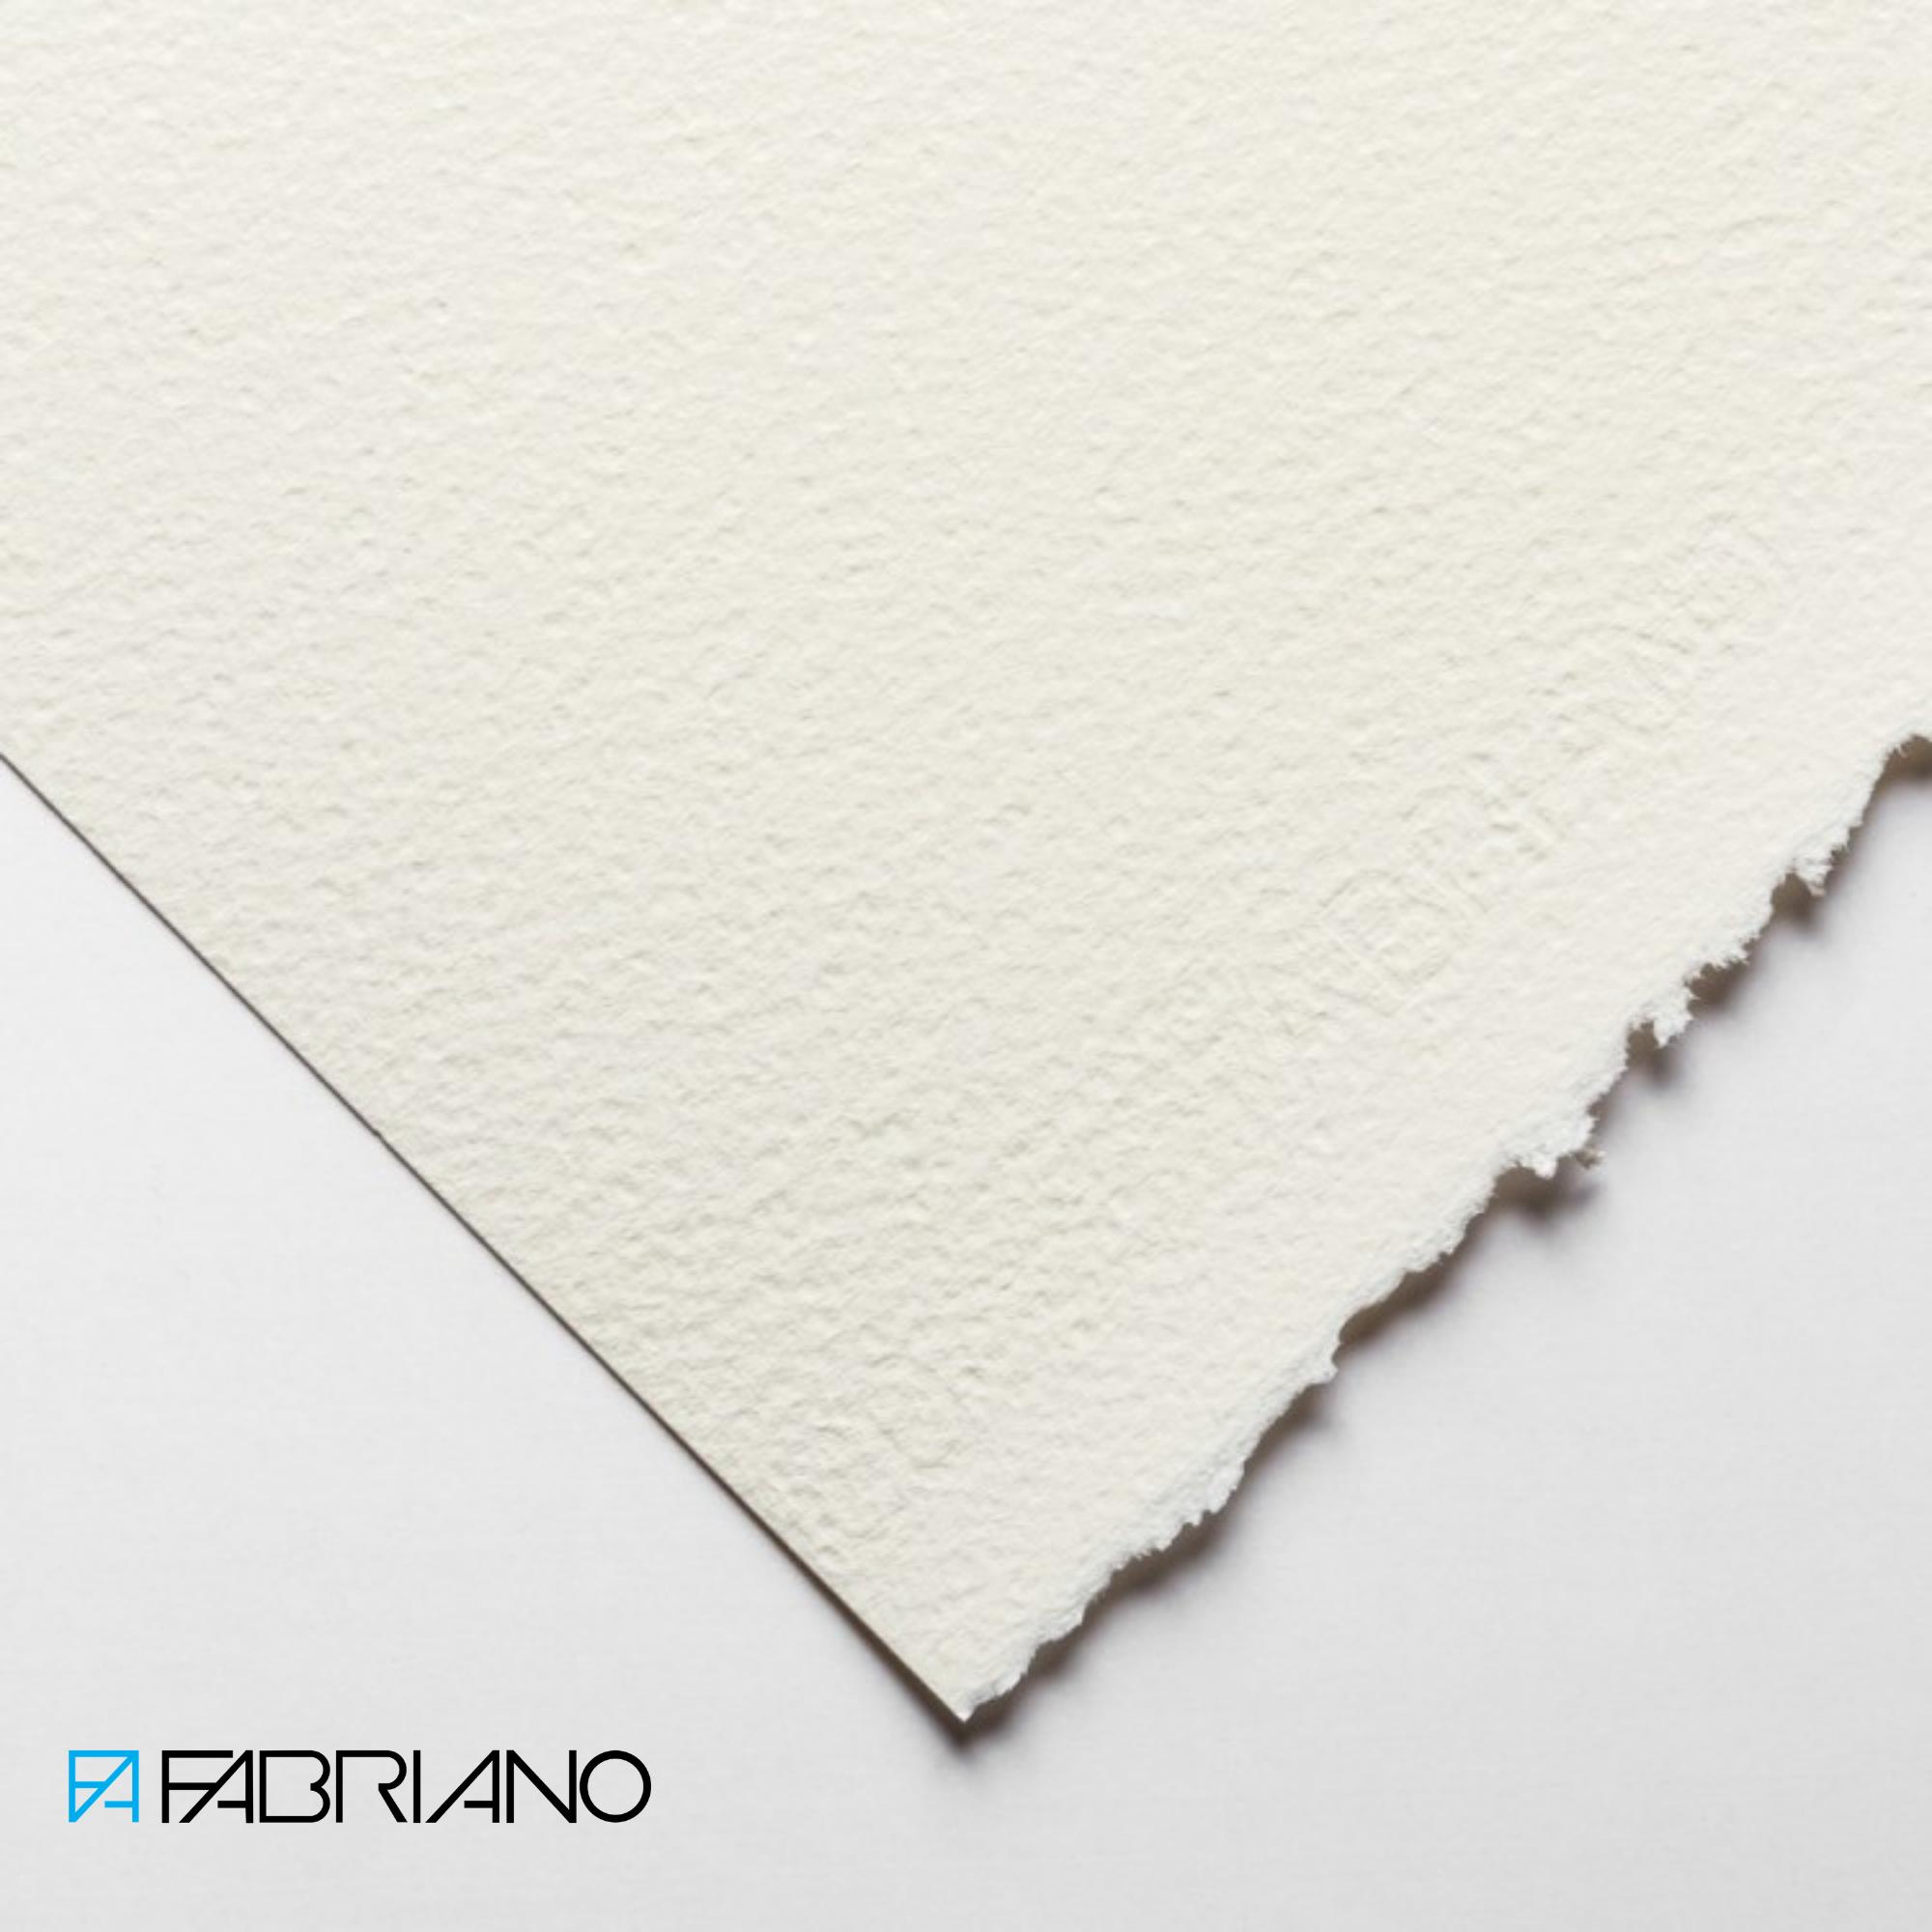 PAPEL FABRIANO ARTÍSTICO 100%300G56X76 RUGOSO